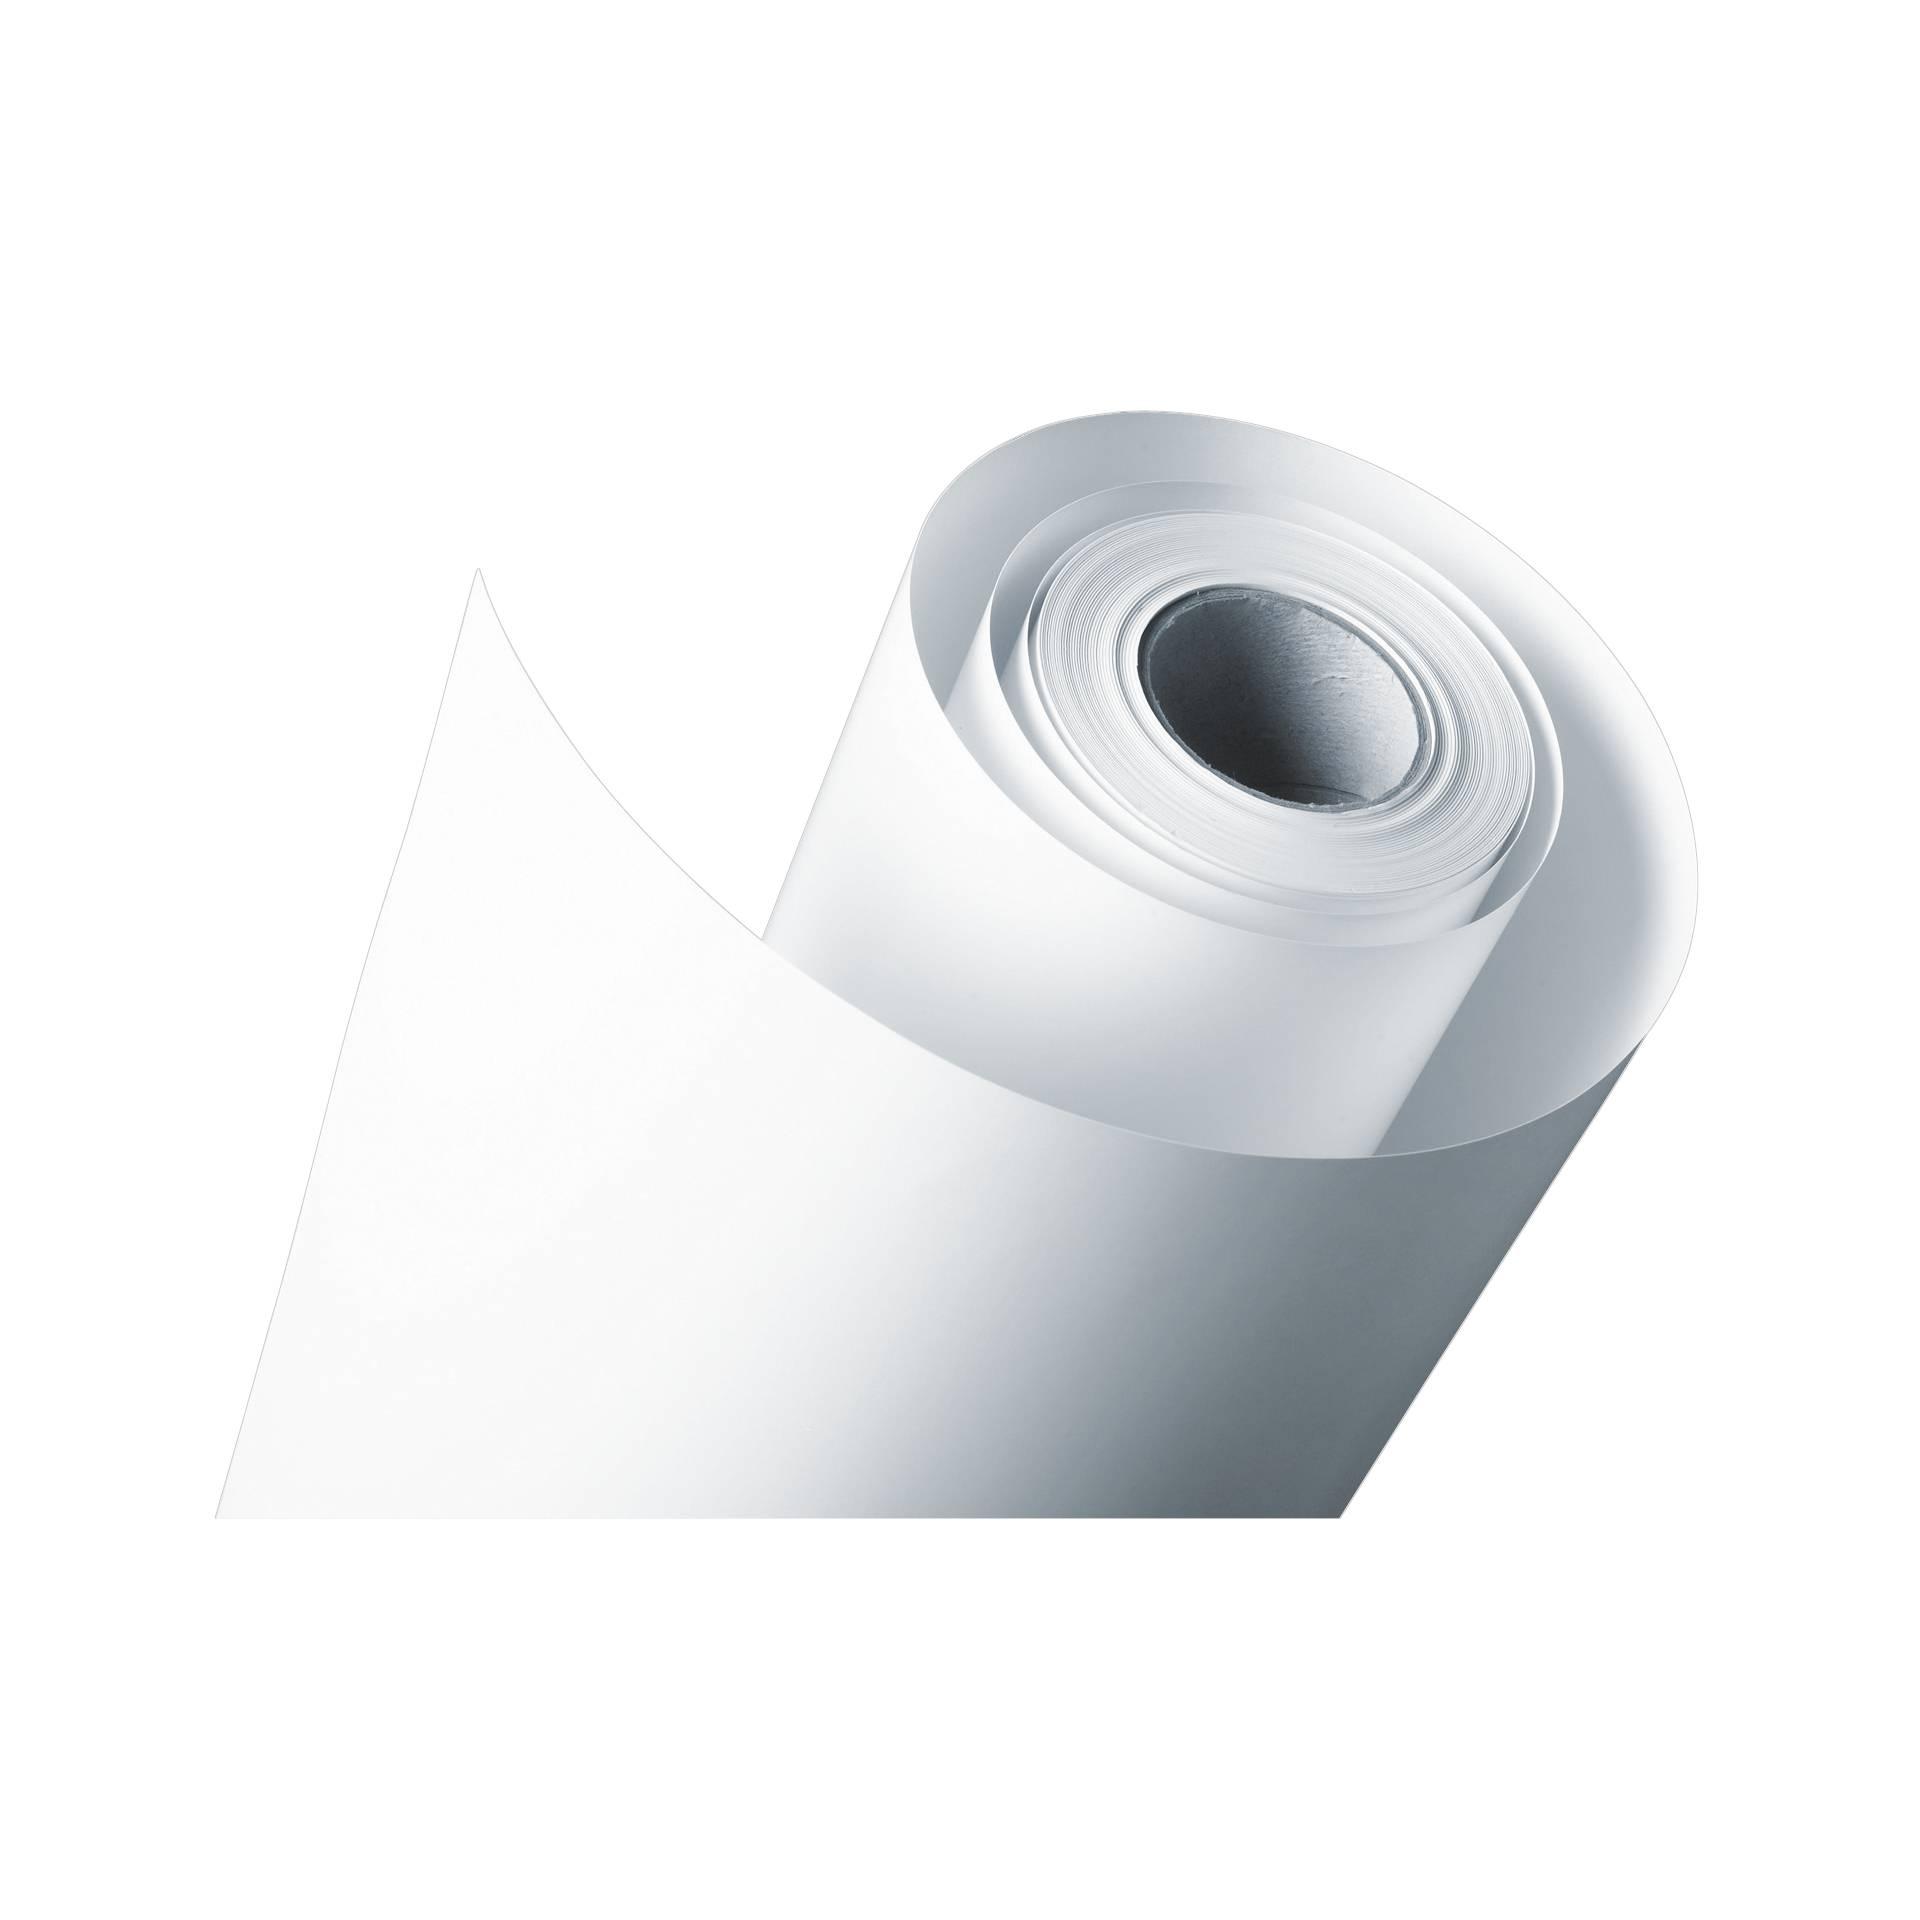 1x2 Fujifilm Dryphotopaper DX 250 g 127 mm x 65 m silk